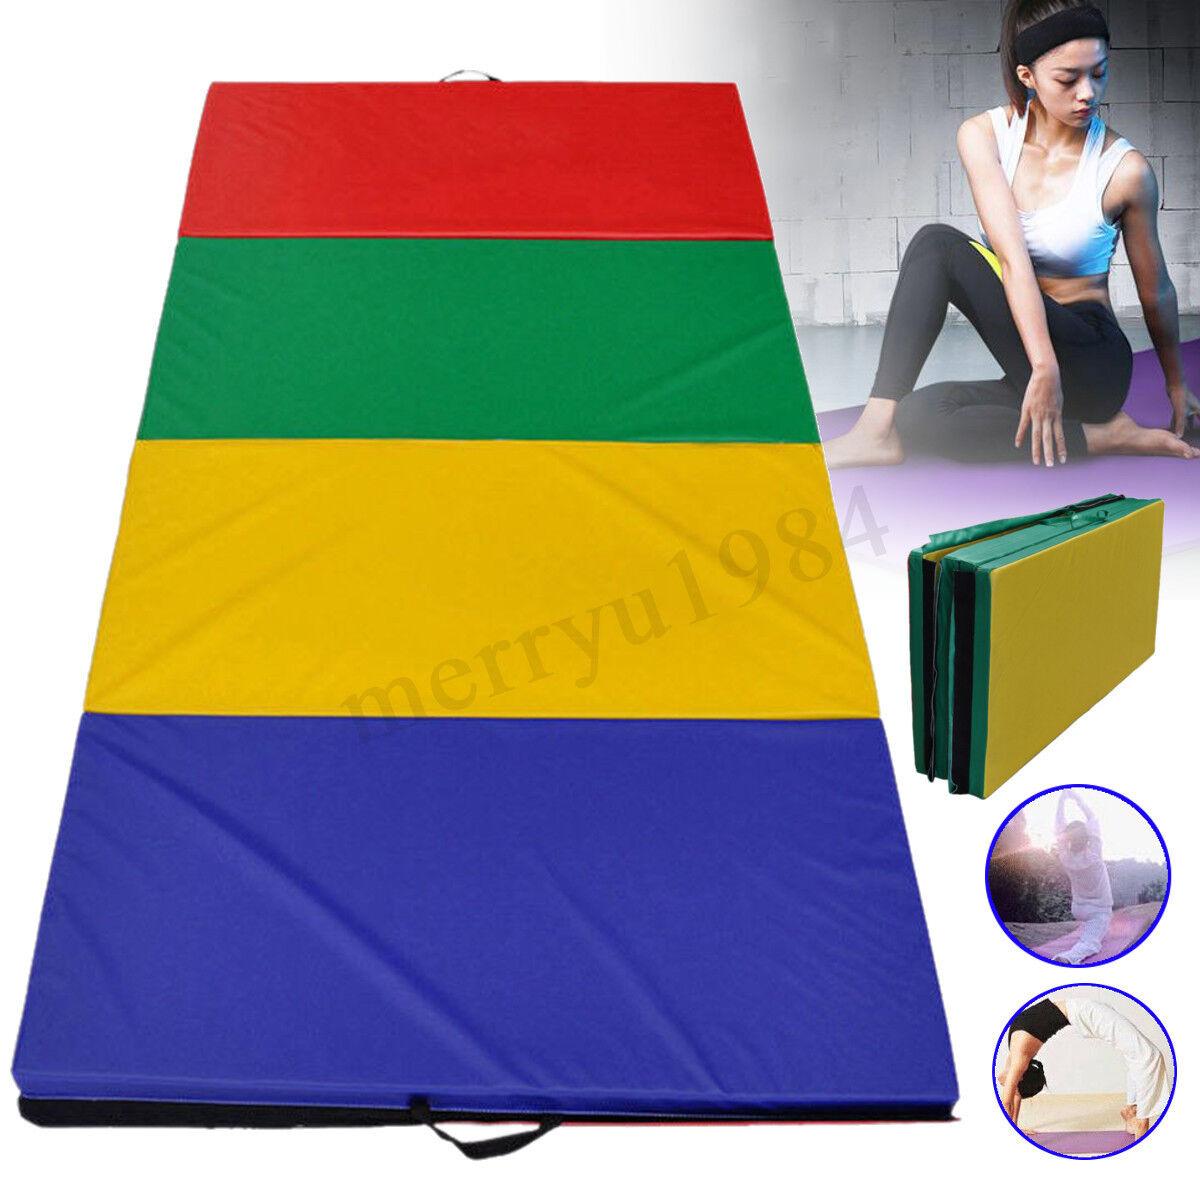 240x120x5cm Gymnastics Panel Folding Mat Gym Exercise Tumbling Fitness Pad UK